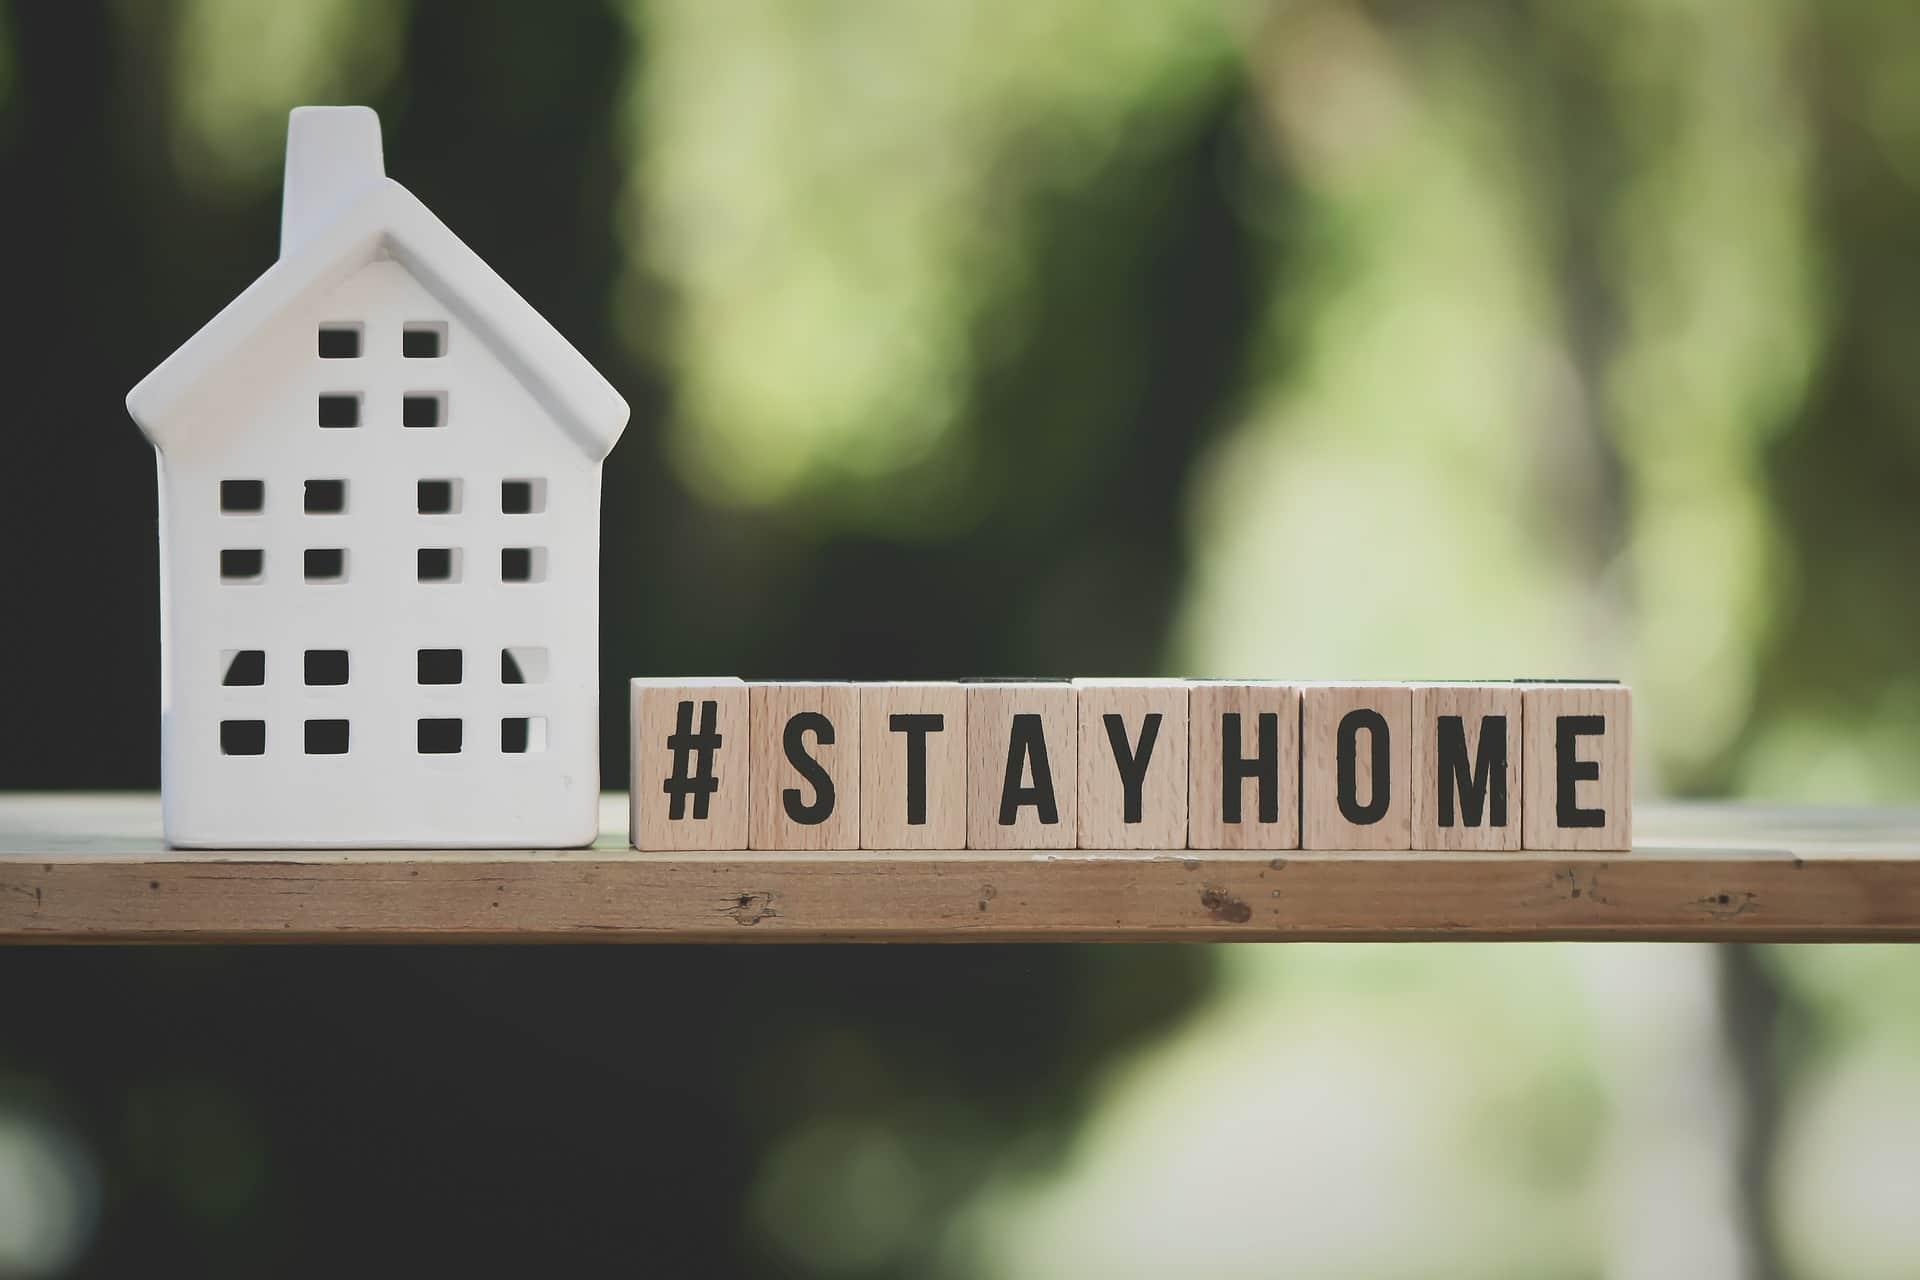 Wegen Corona zuhause bleiben